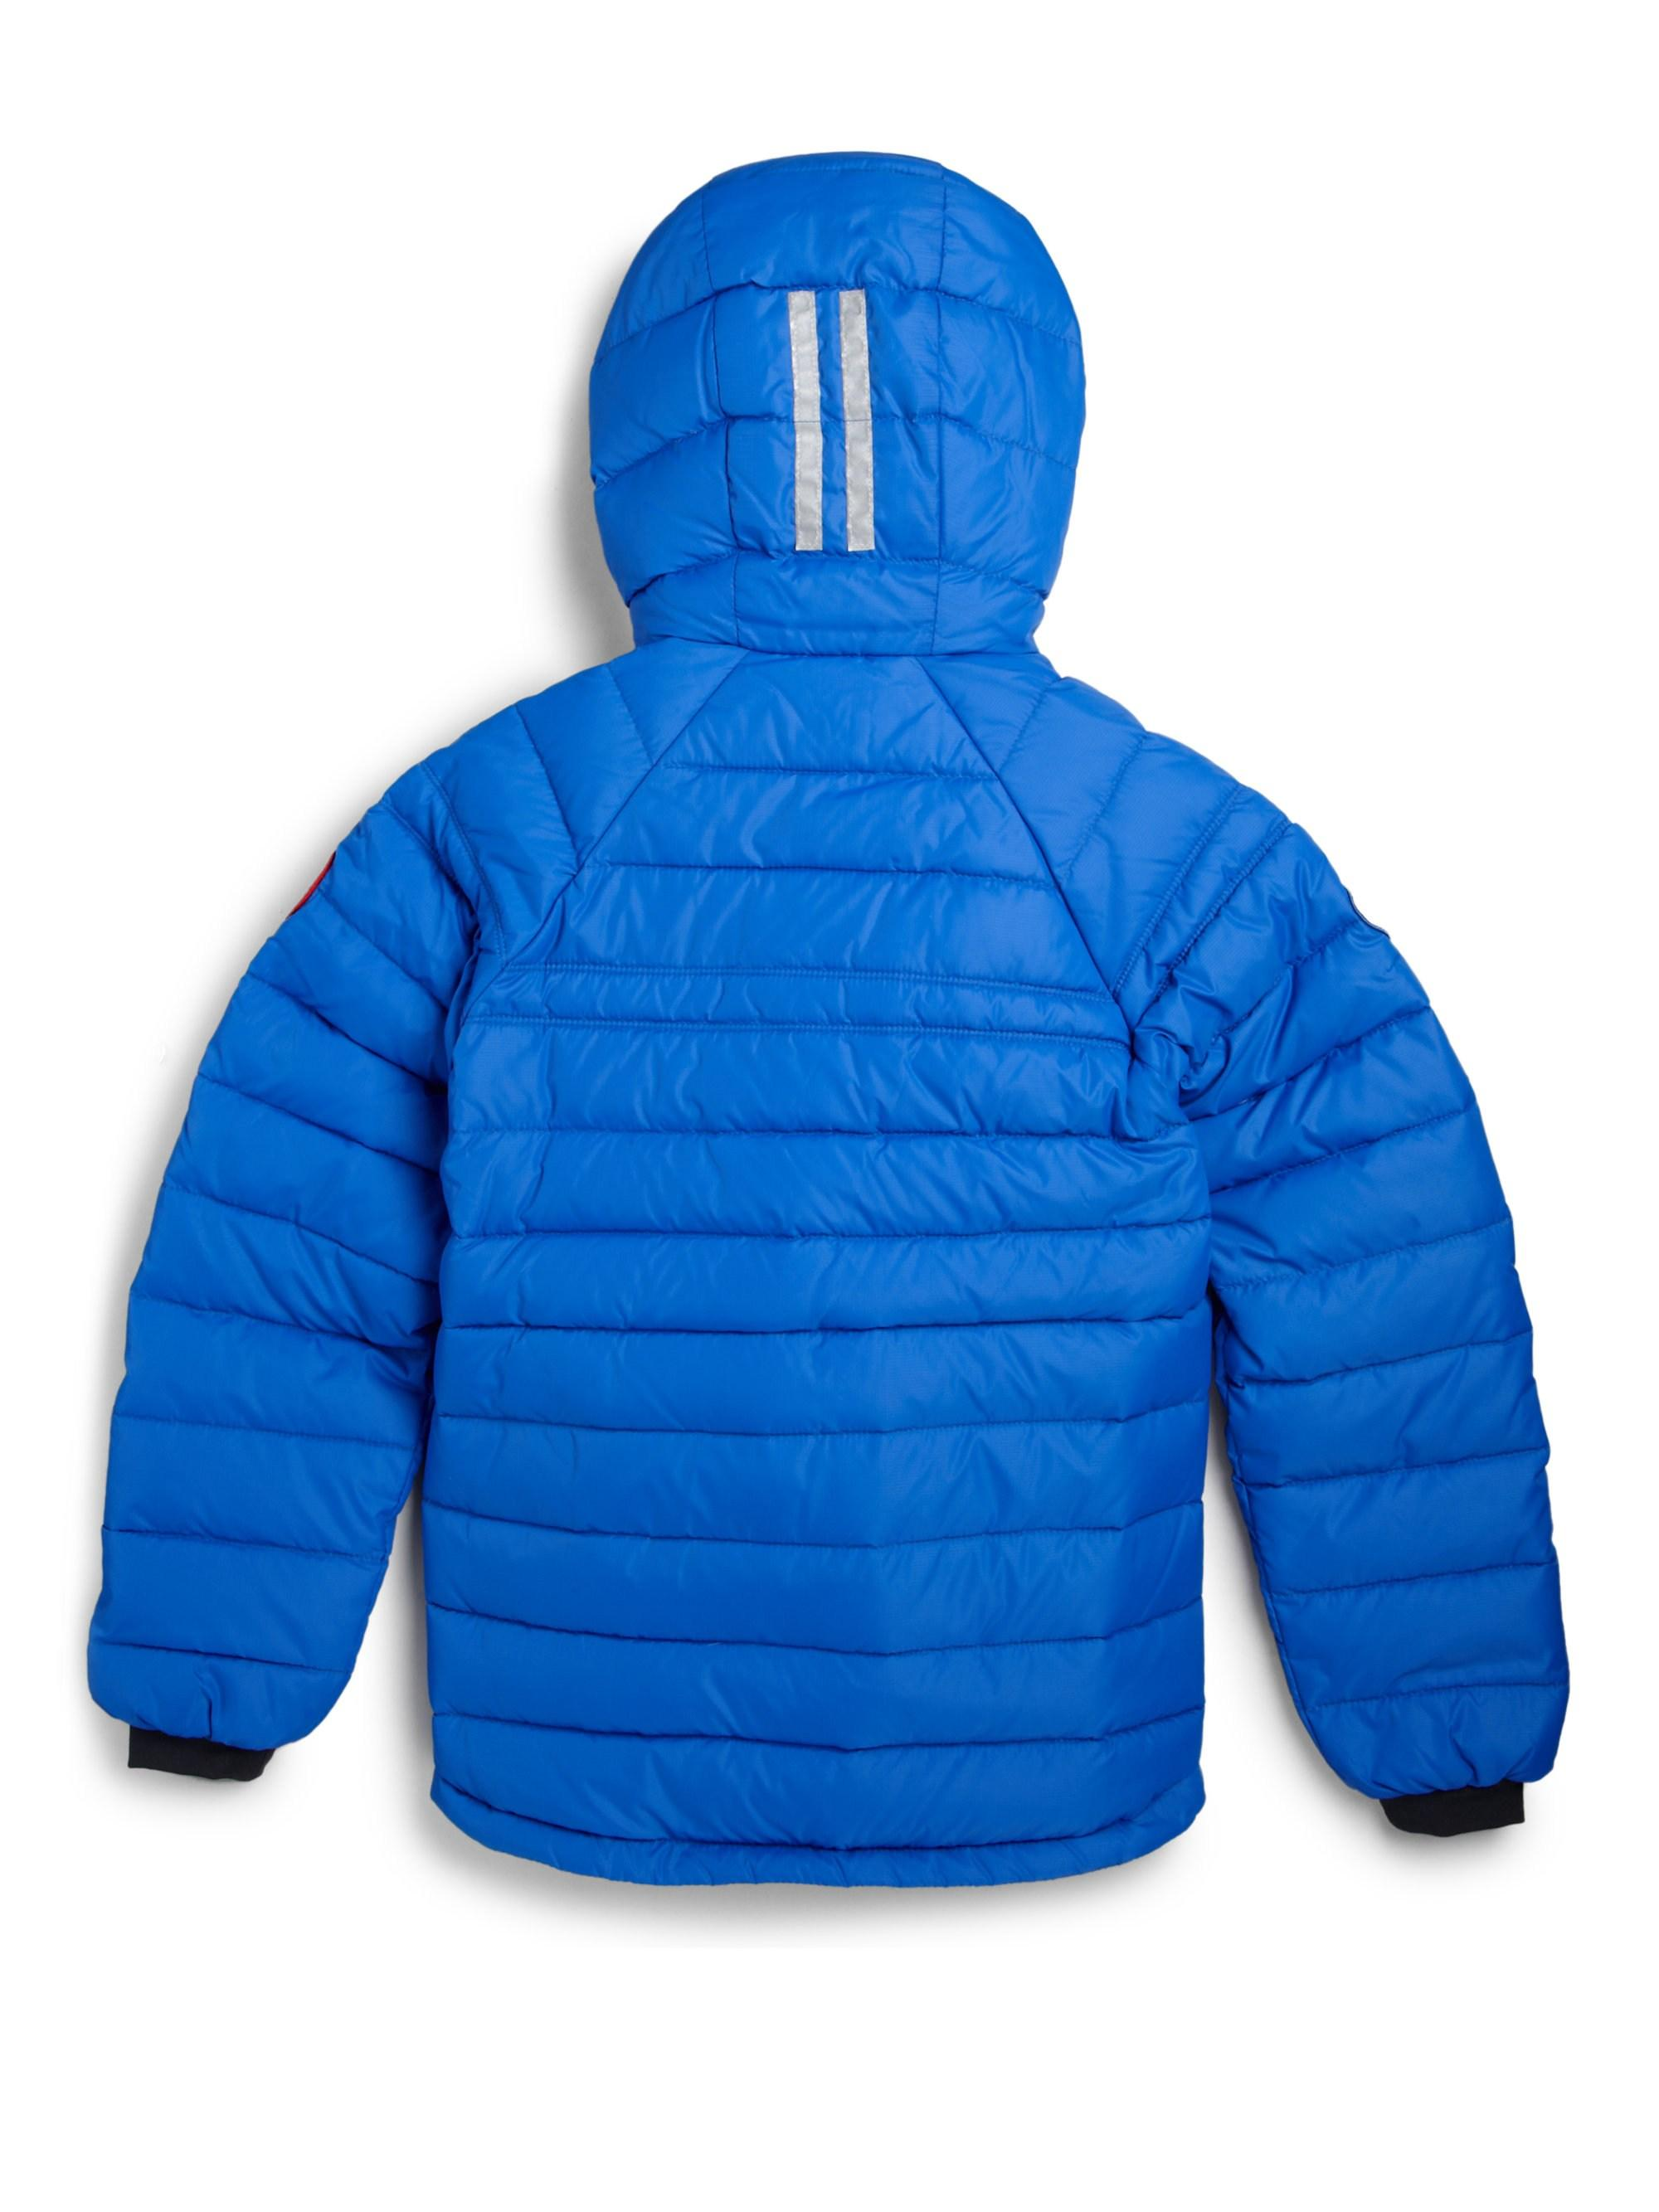 9a932b388 Lyst - Canada Goose Boy s Sherwood Down Hoodie Jacket in Blue for Men